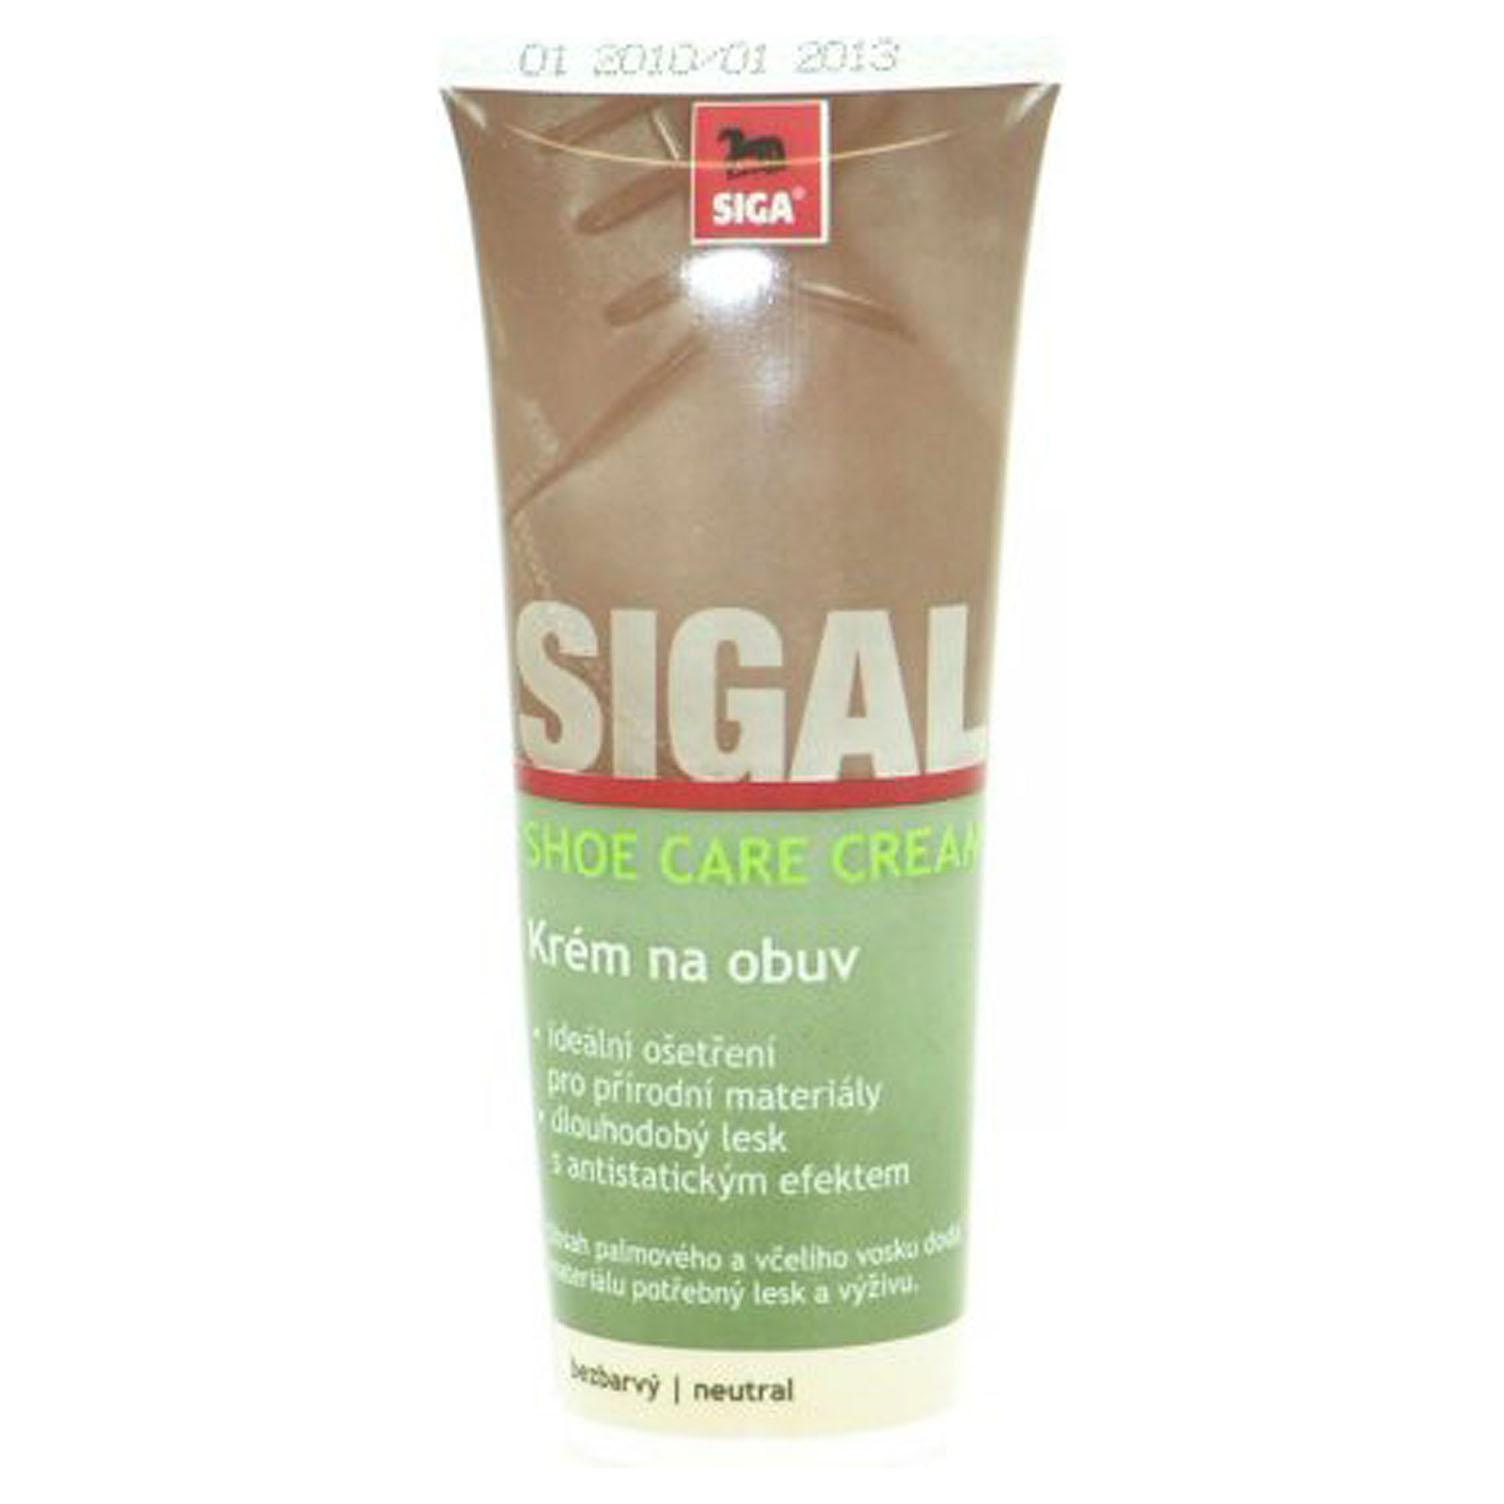 Ecco Sigal krém s aplikátorem - neutral 12601394